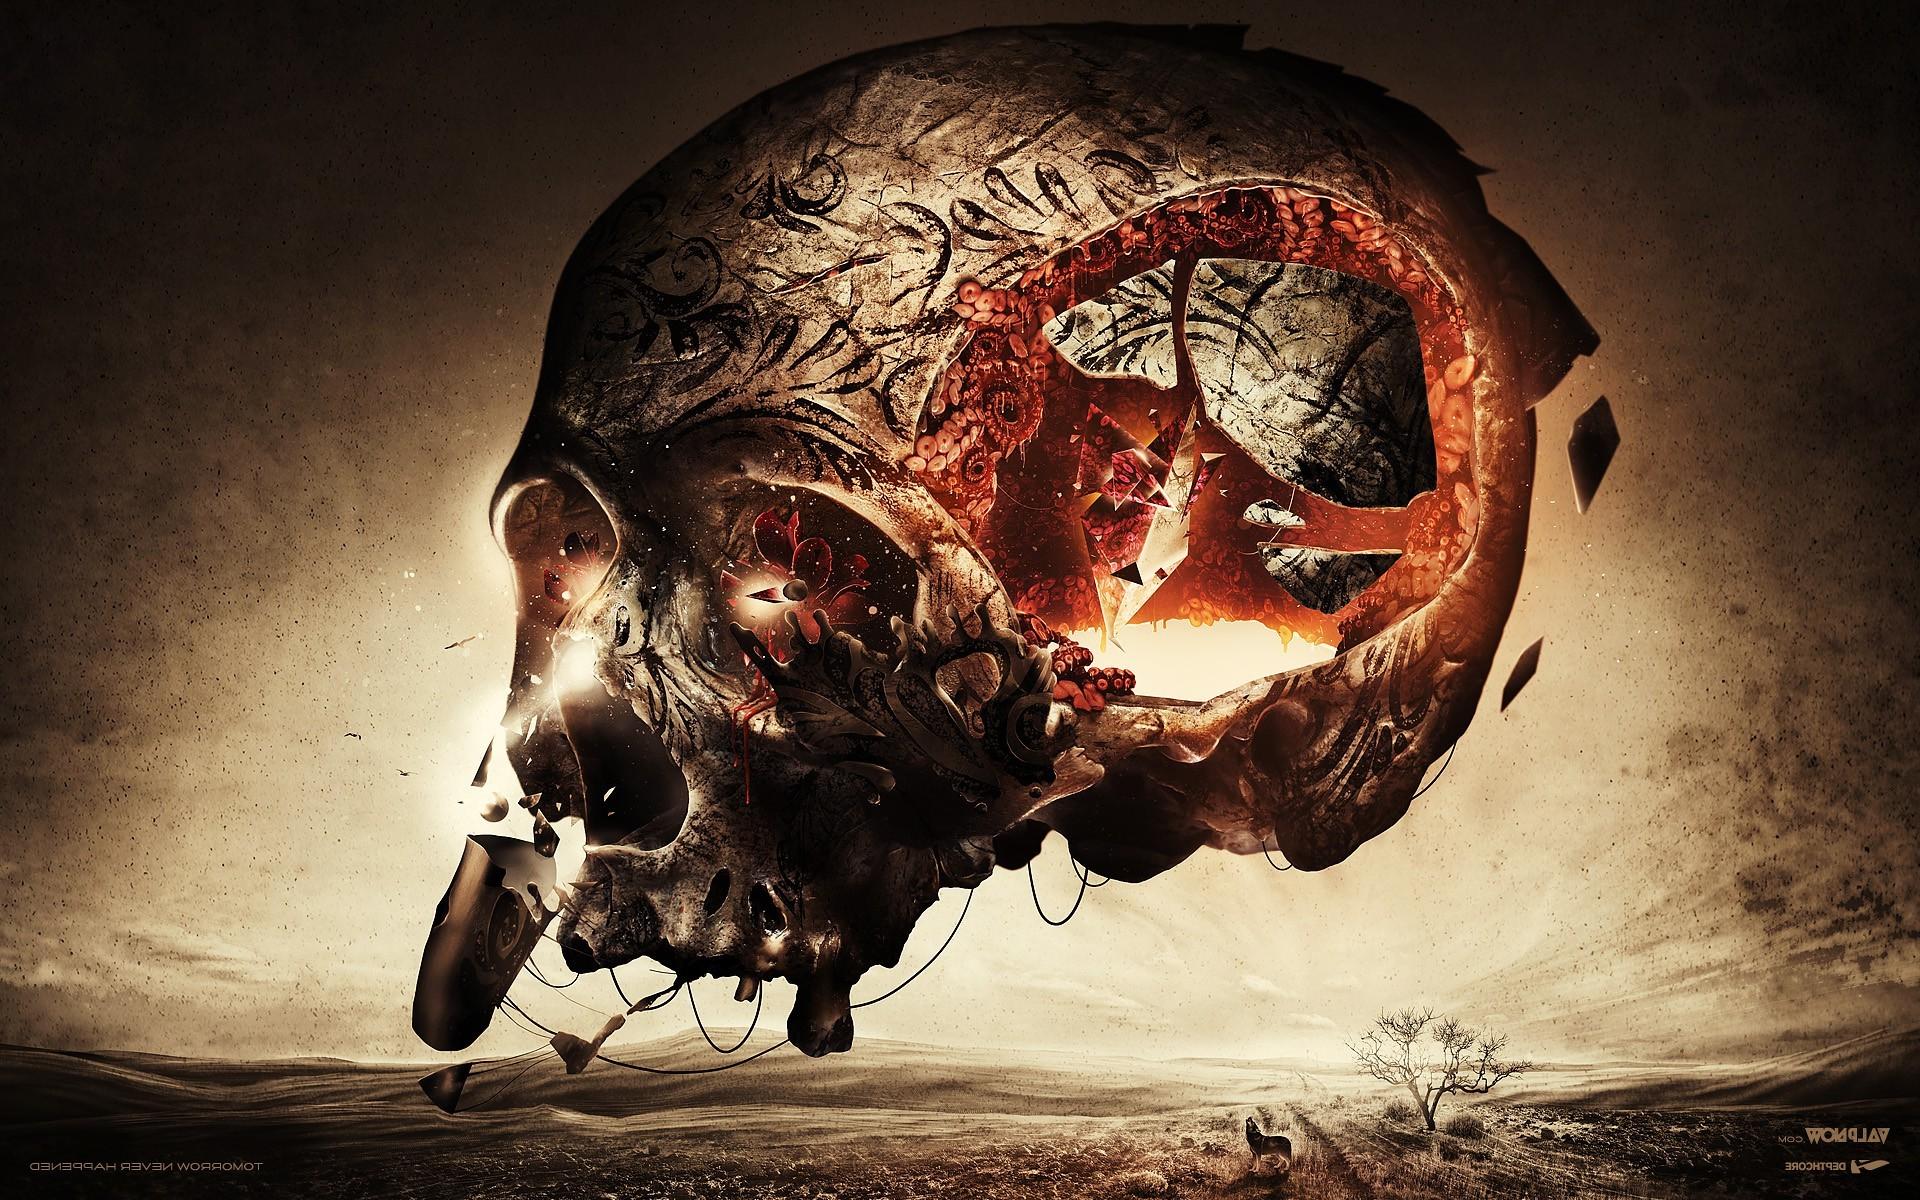 Abstract Skull Wallpaper 73 Images